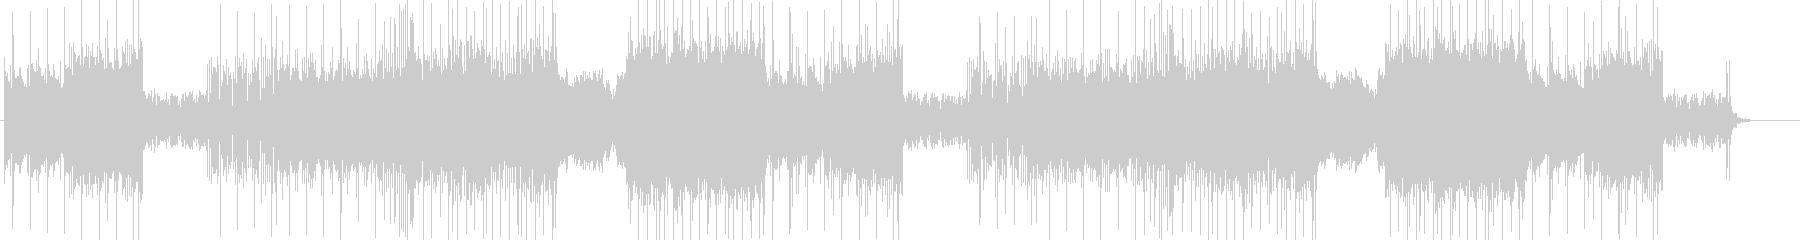 「DARK/ROCK」BGM330の未再生の波形